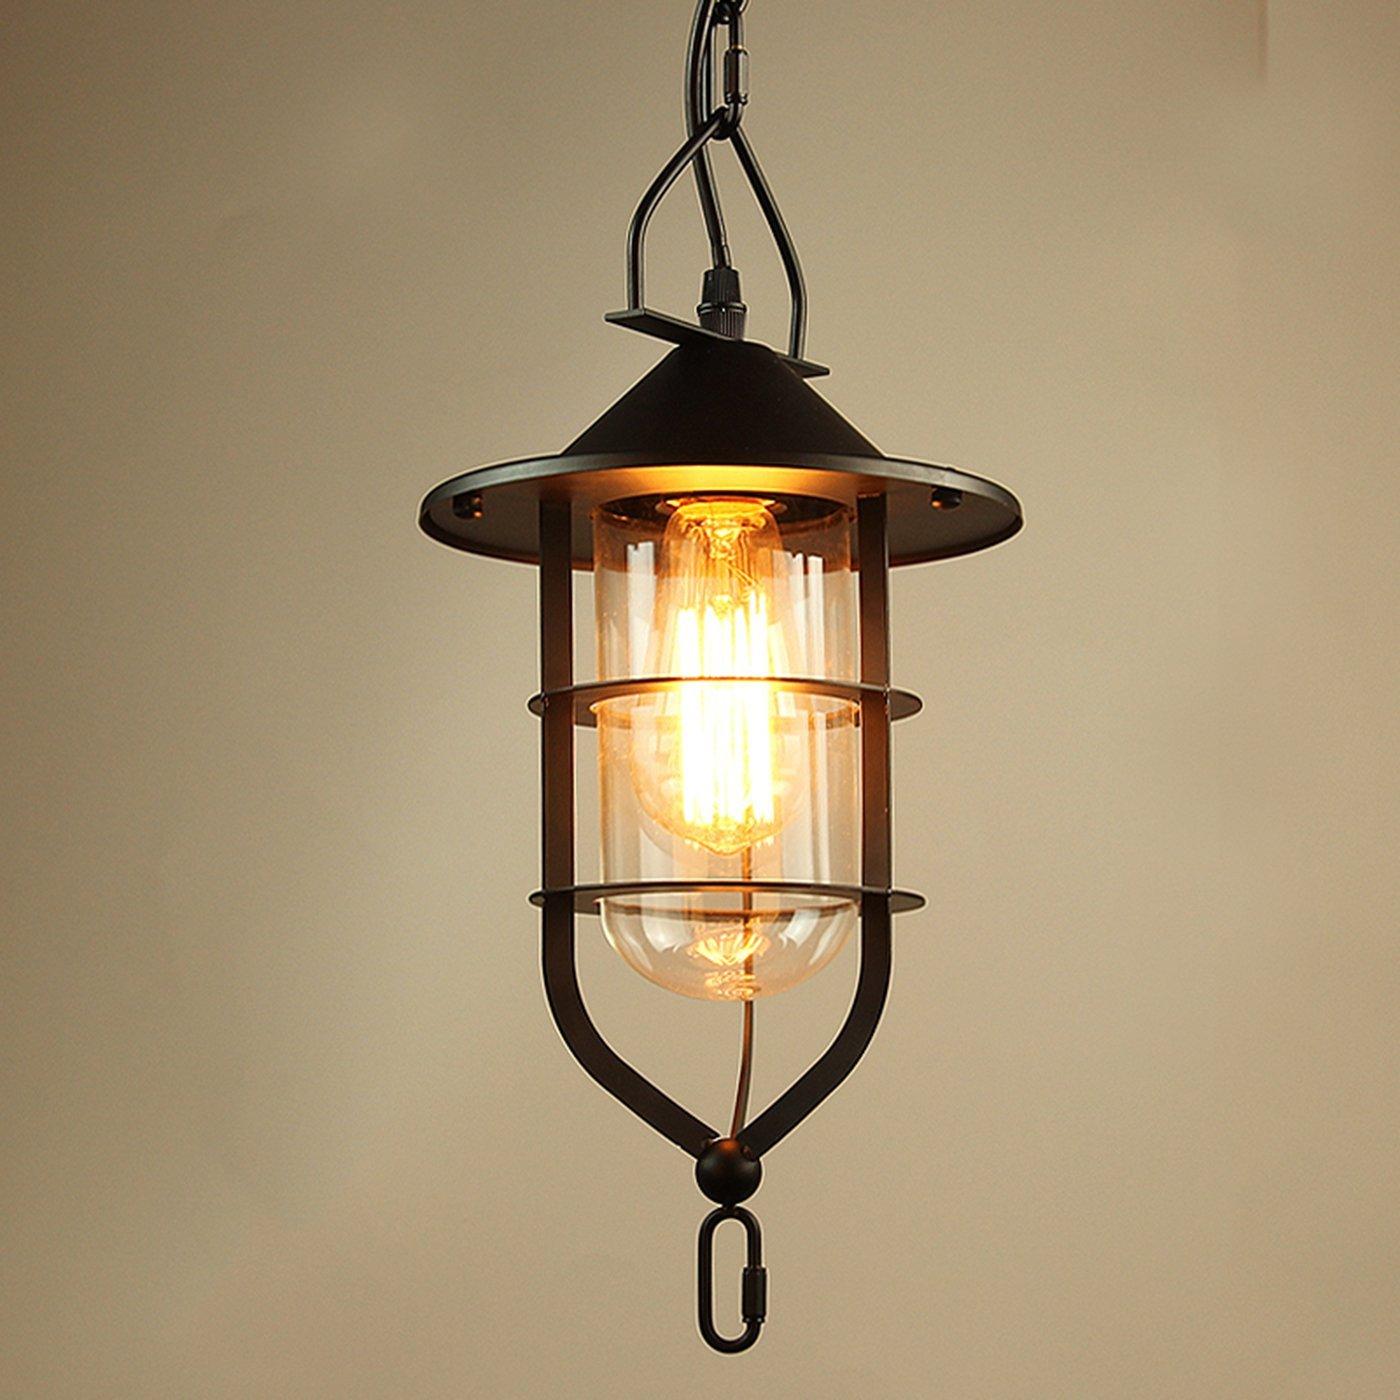 Ganeed Vintage 1 light Antique Pendant light Home Fixtures Lighting